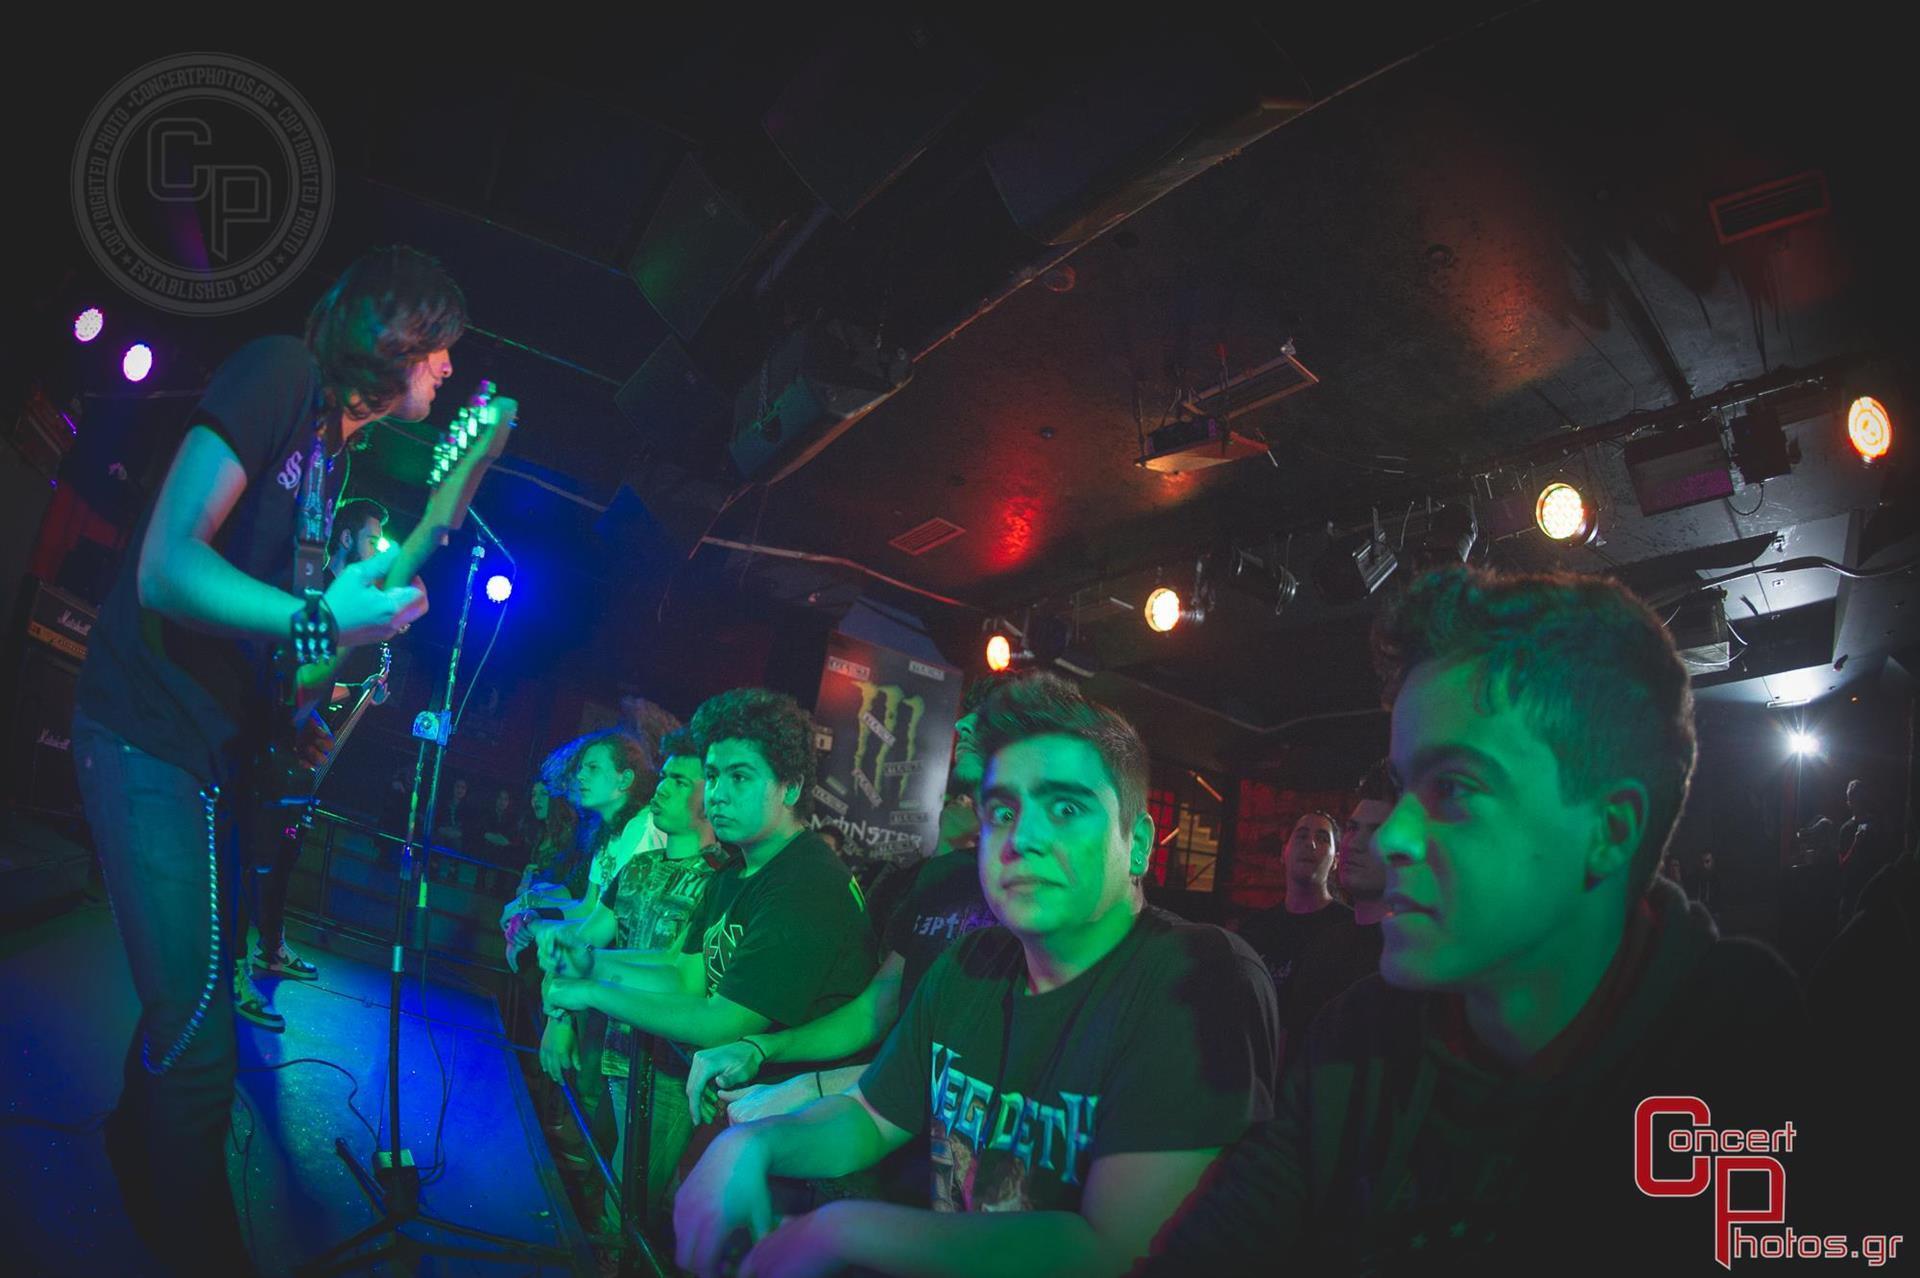 Battle Of The Bands Athens - Leg 3- photographer:  - ConcertPhotos - 20150104_2321_51